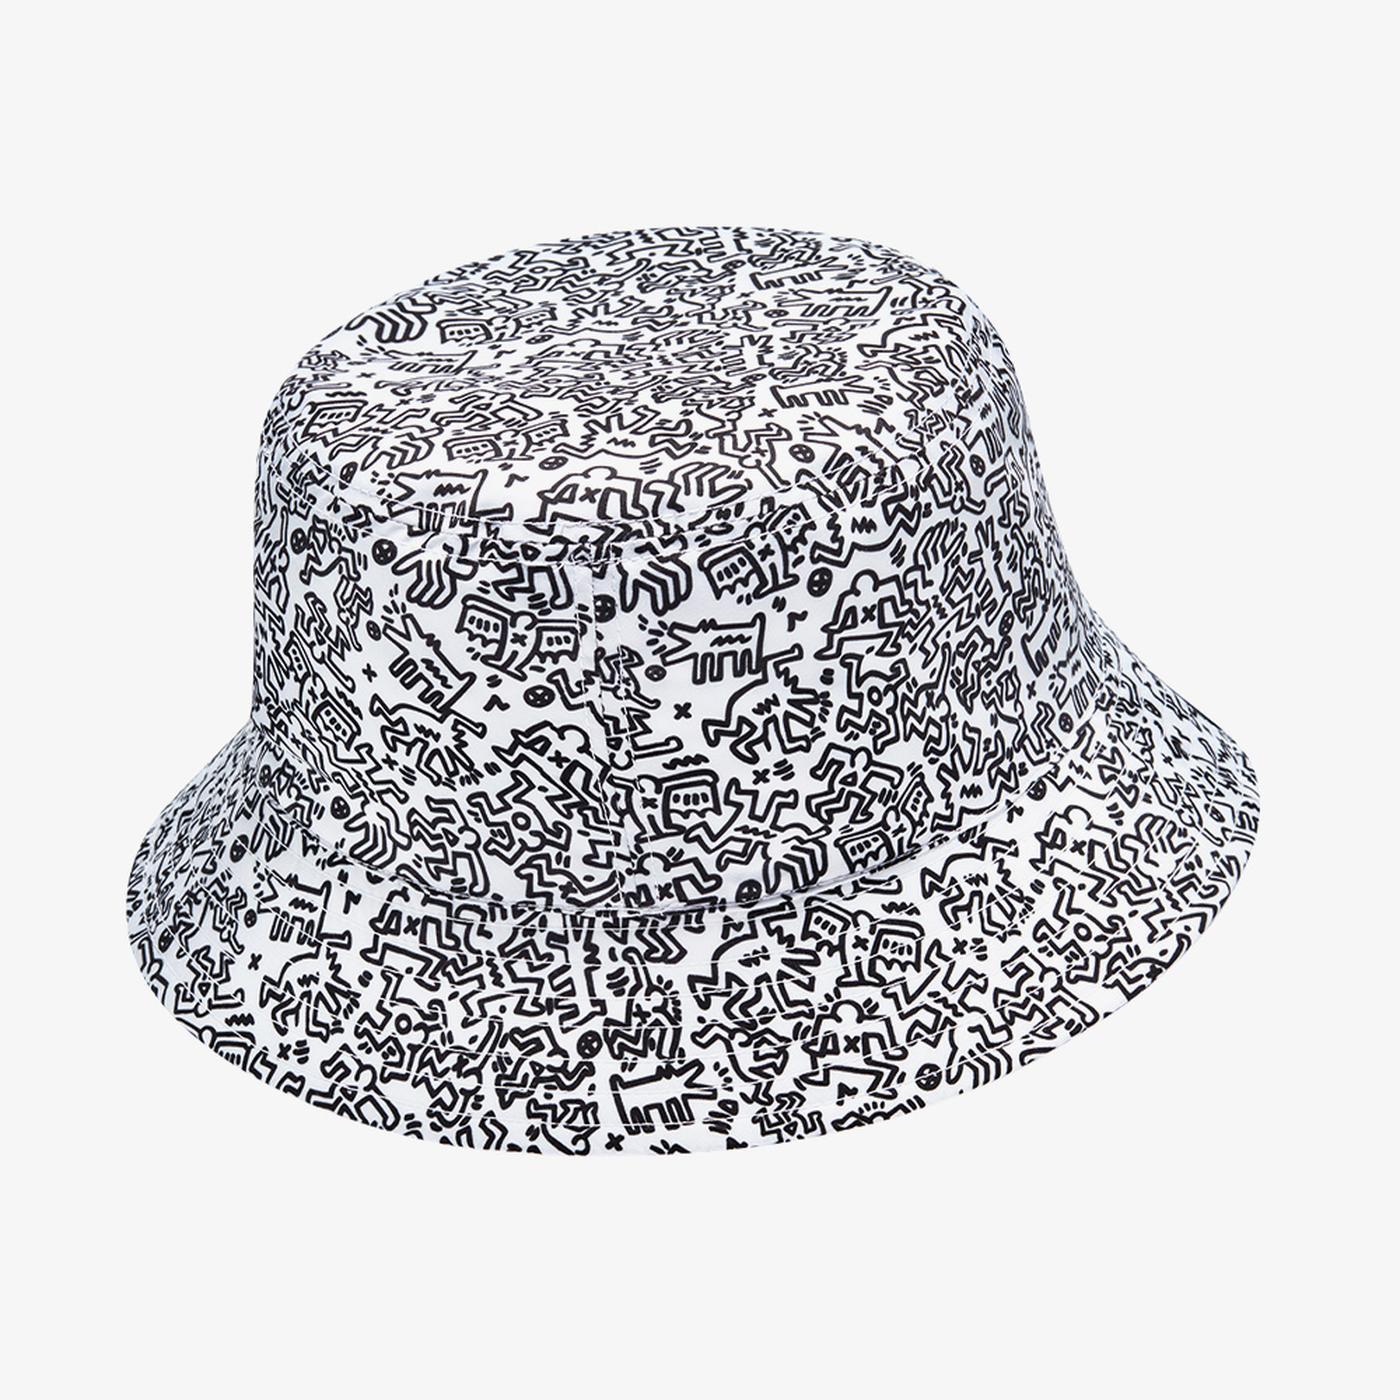 Converse x Keith Haring Çift Taraflı Unisex Beyaz Şapka